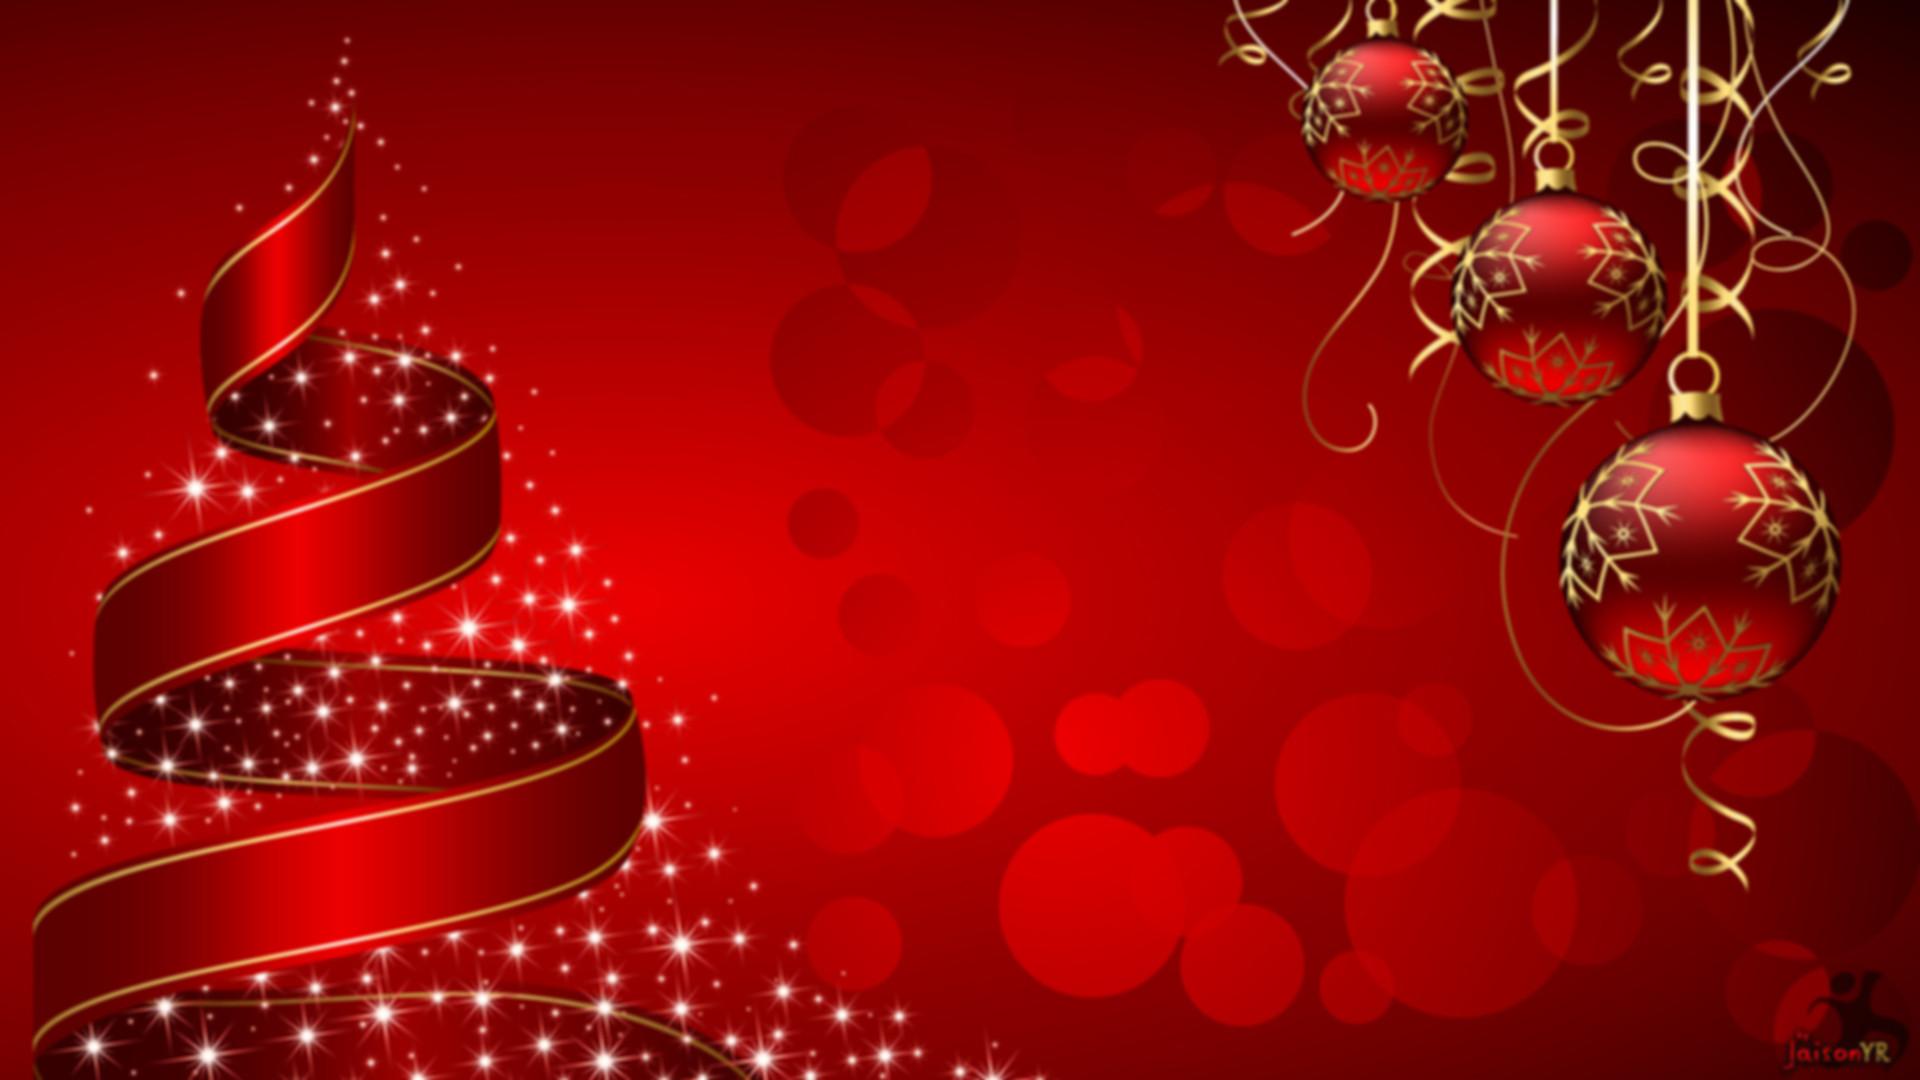 Christmas_background-6_edited.jpg